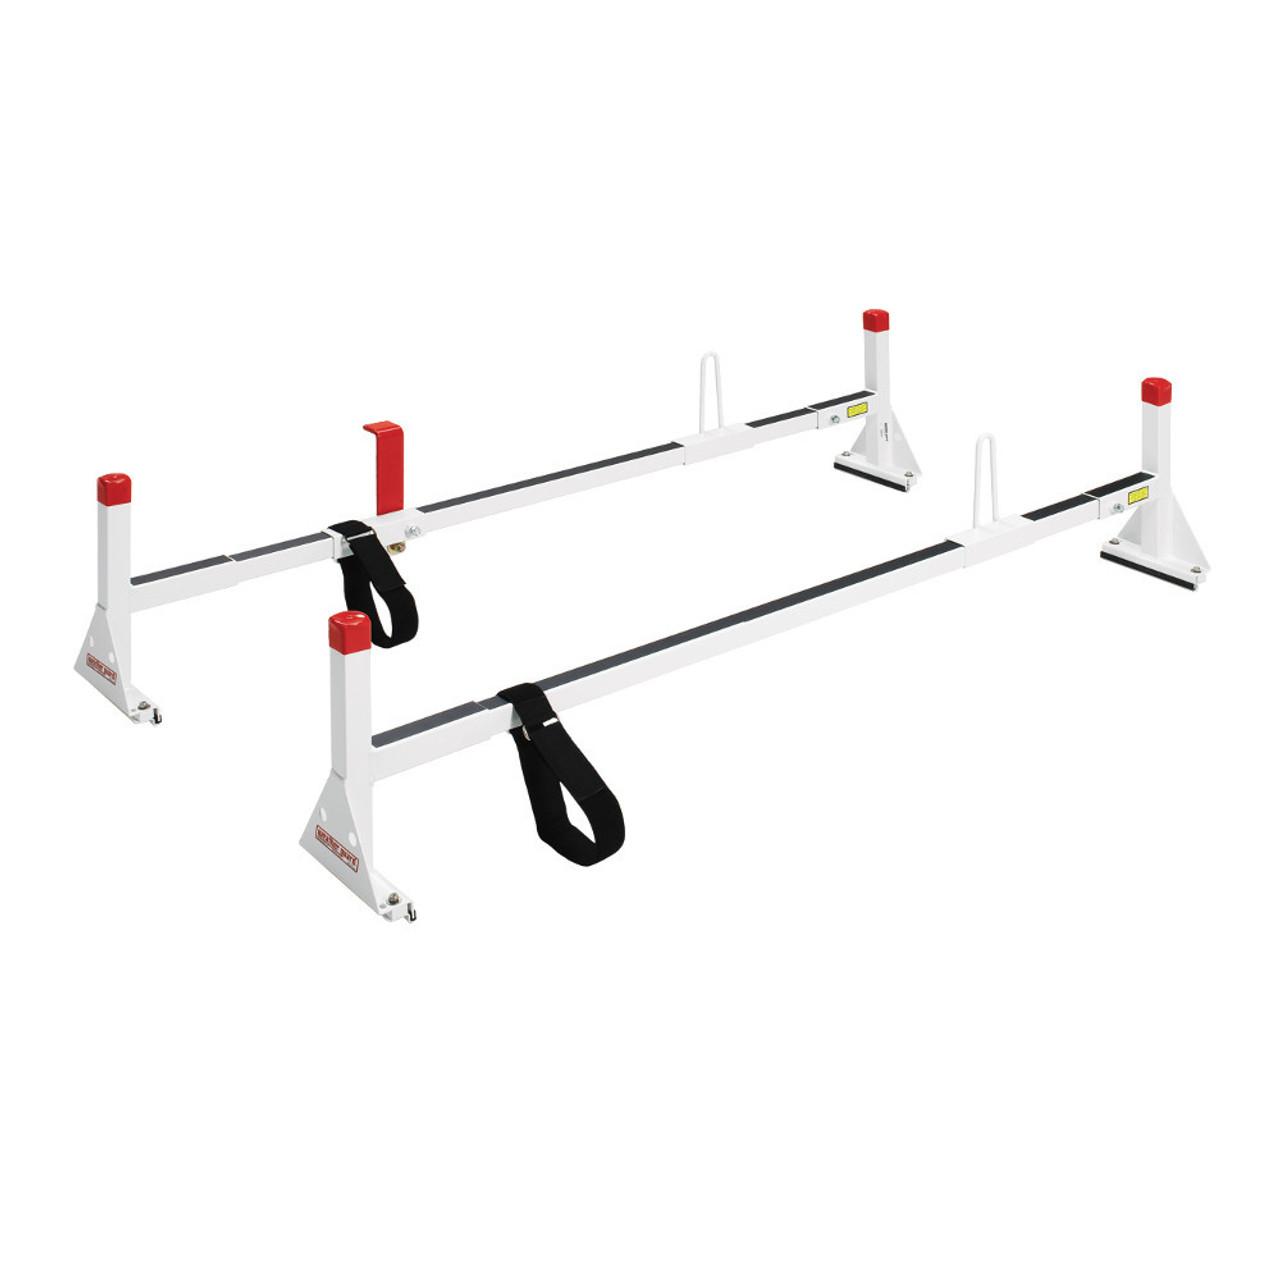 Transit LR/RL Ladder Racks